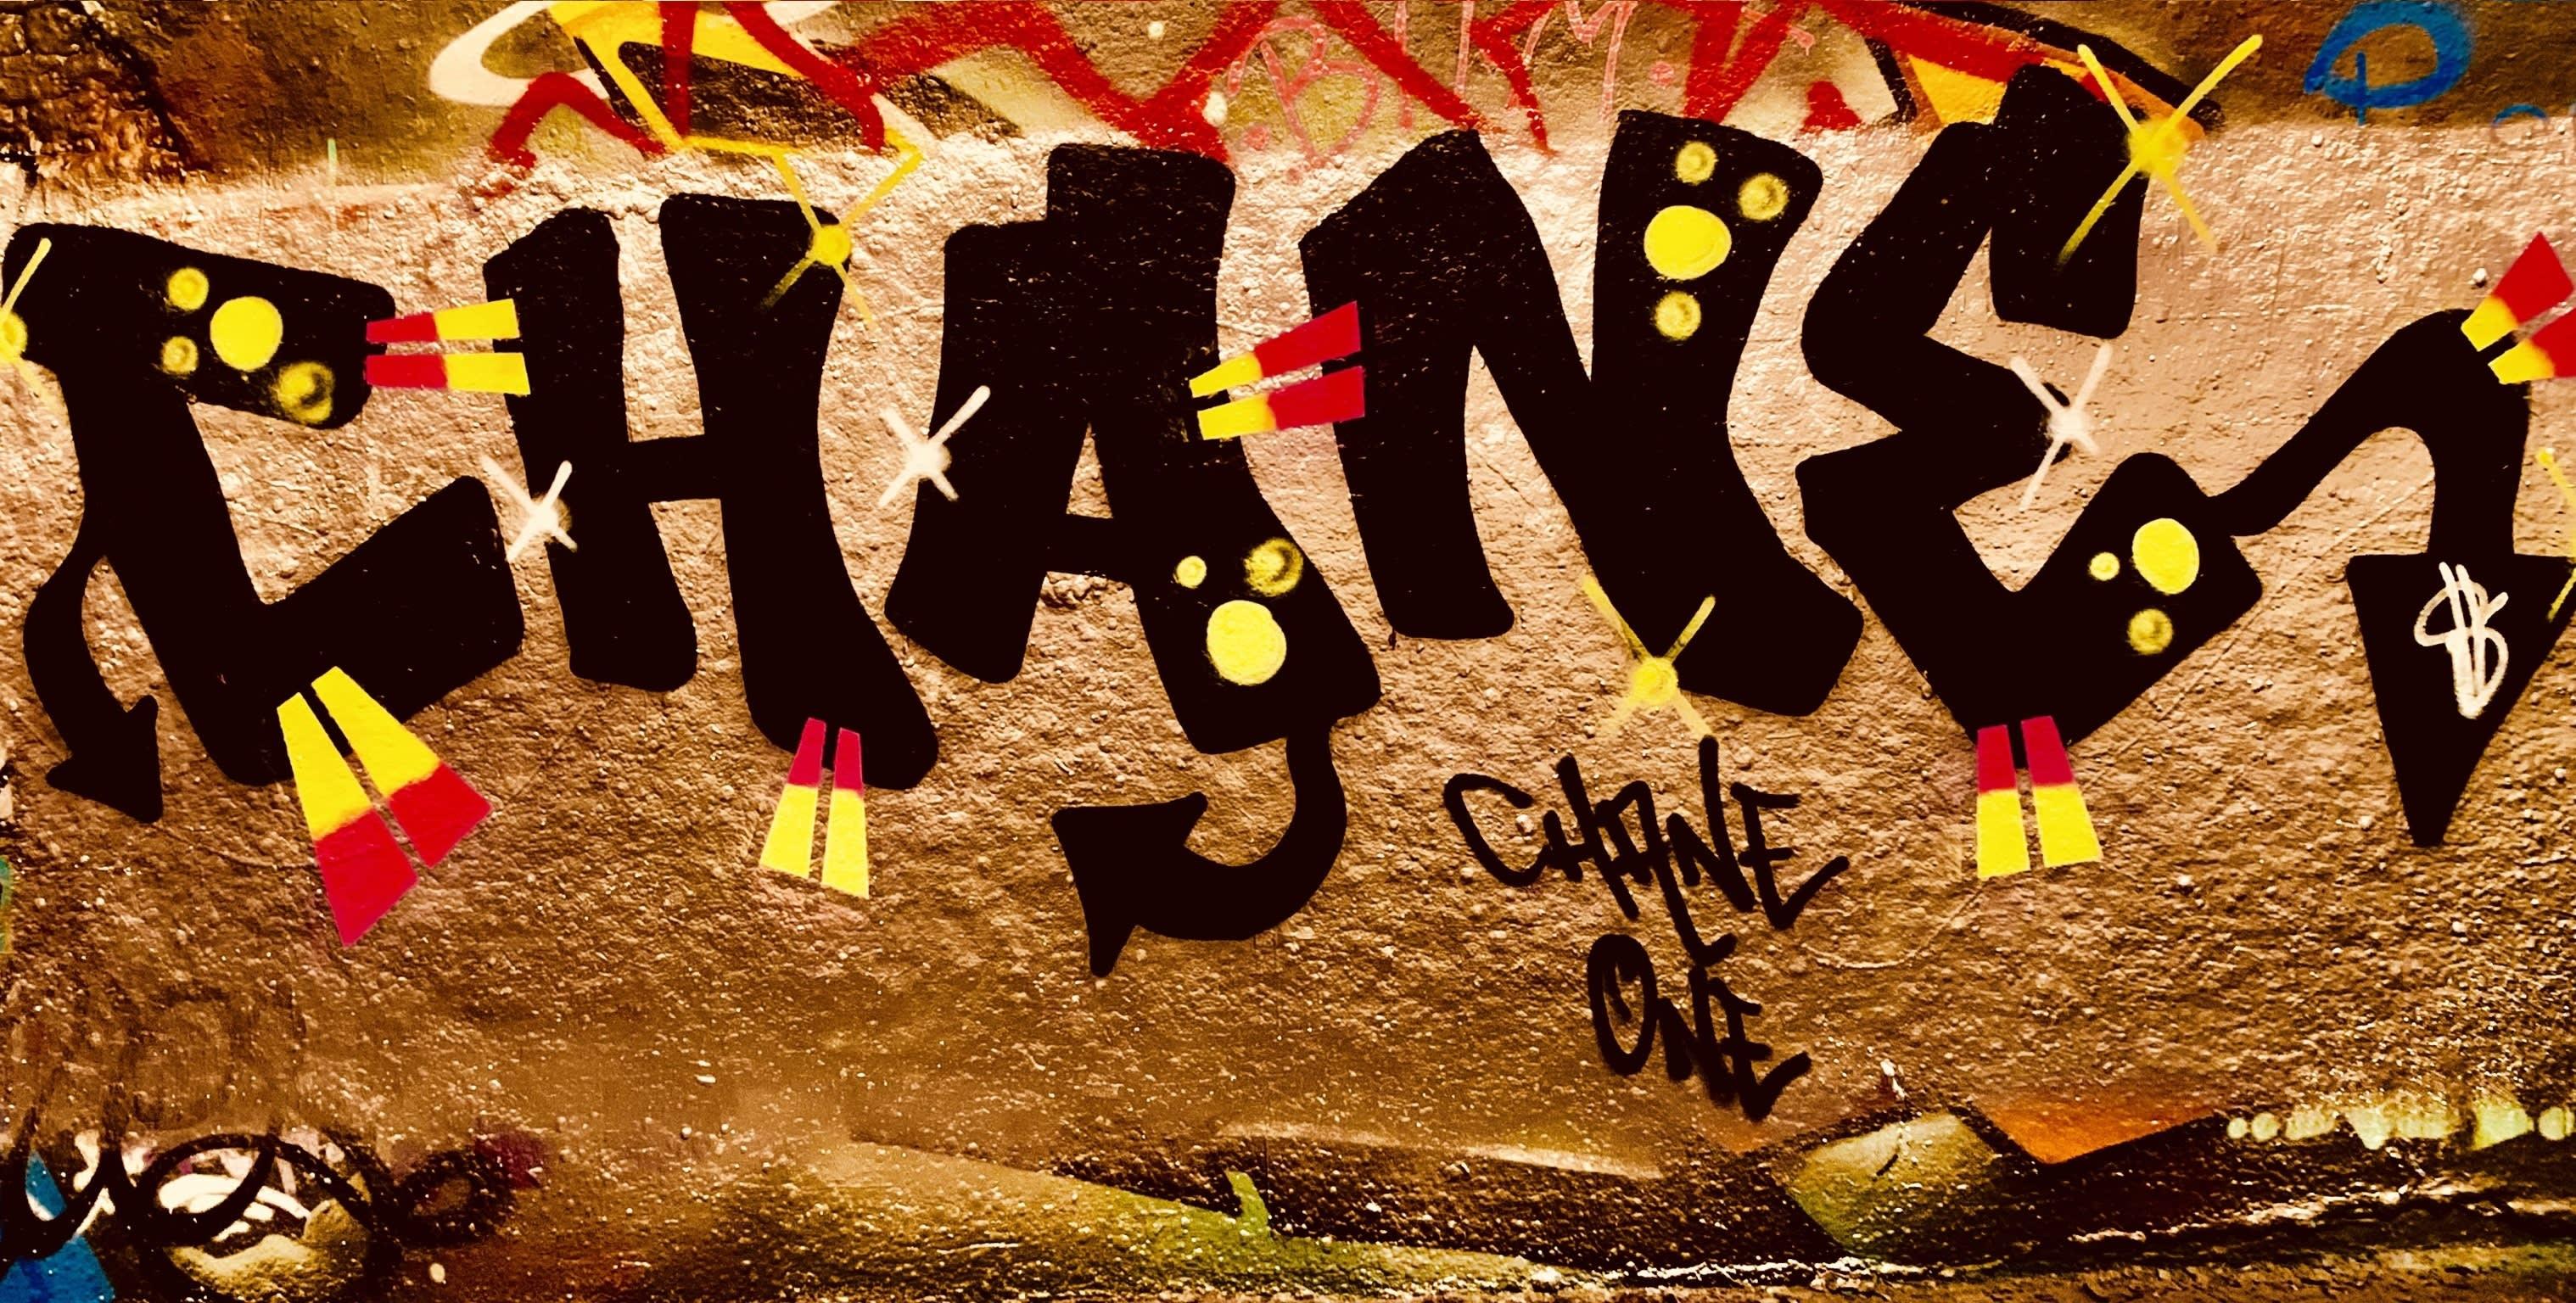 Chane One Clothing